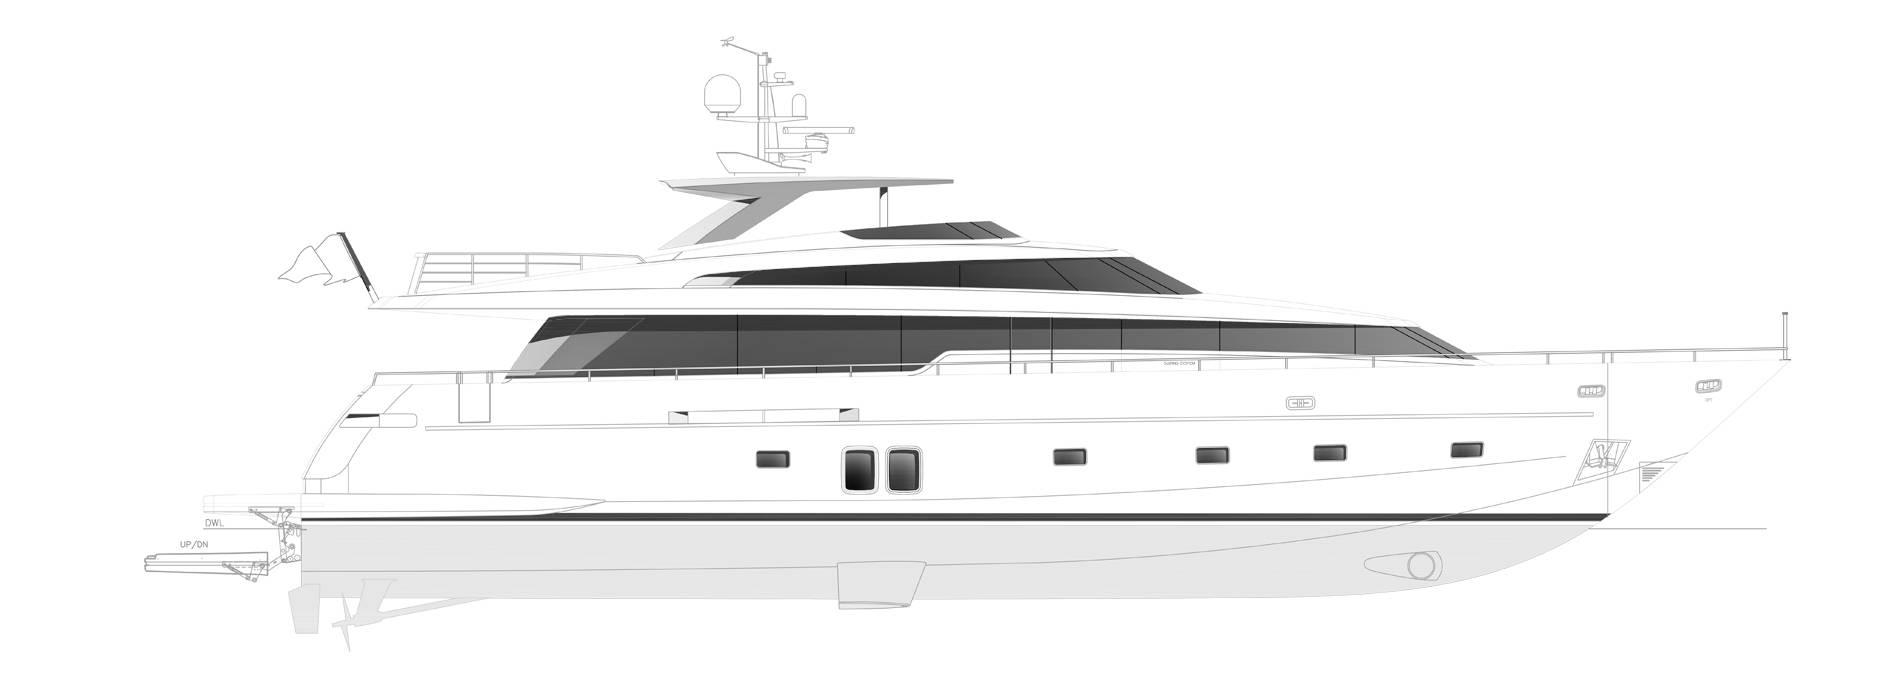 Sanlorenzo Yachts SL96-631 under offer 外观